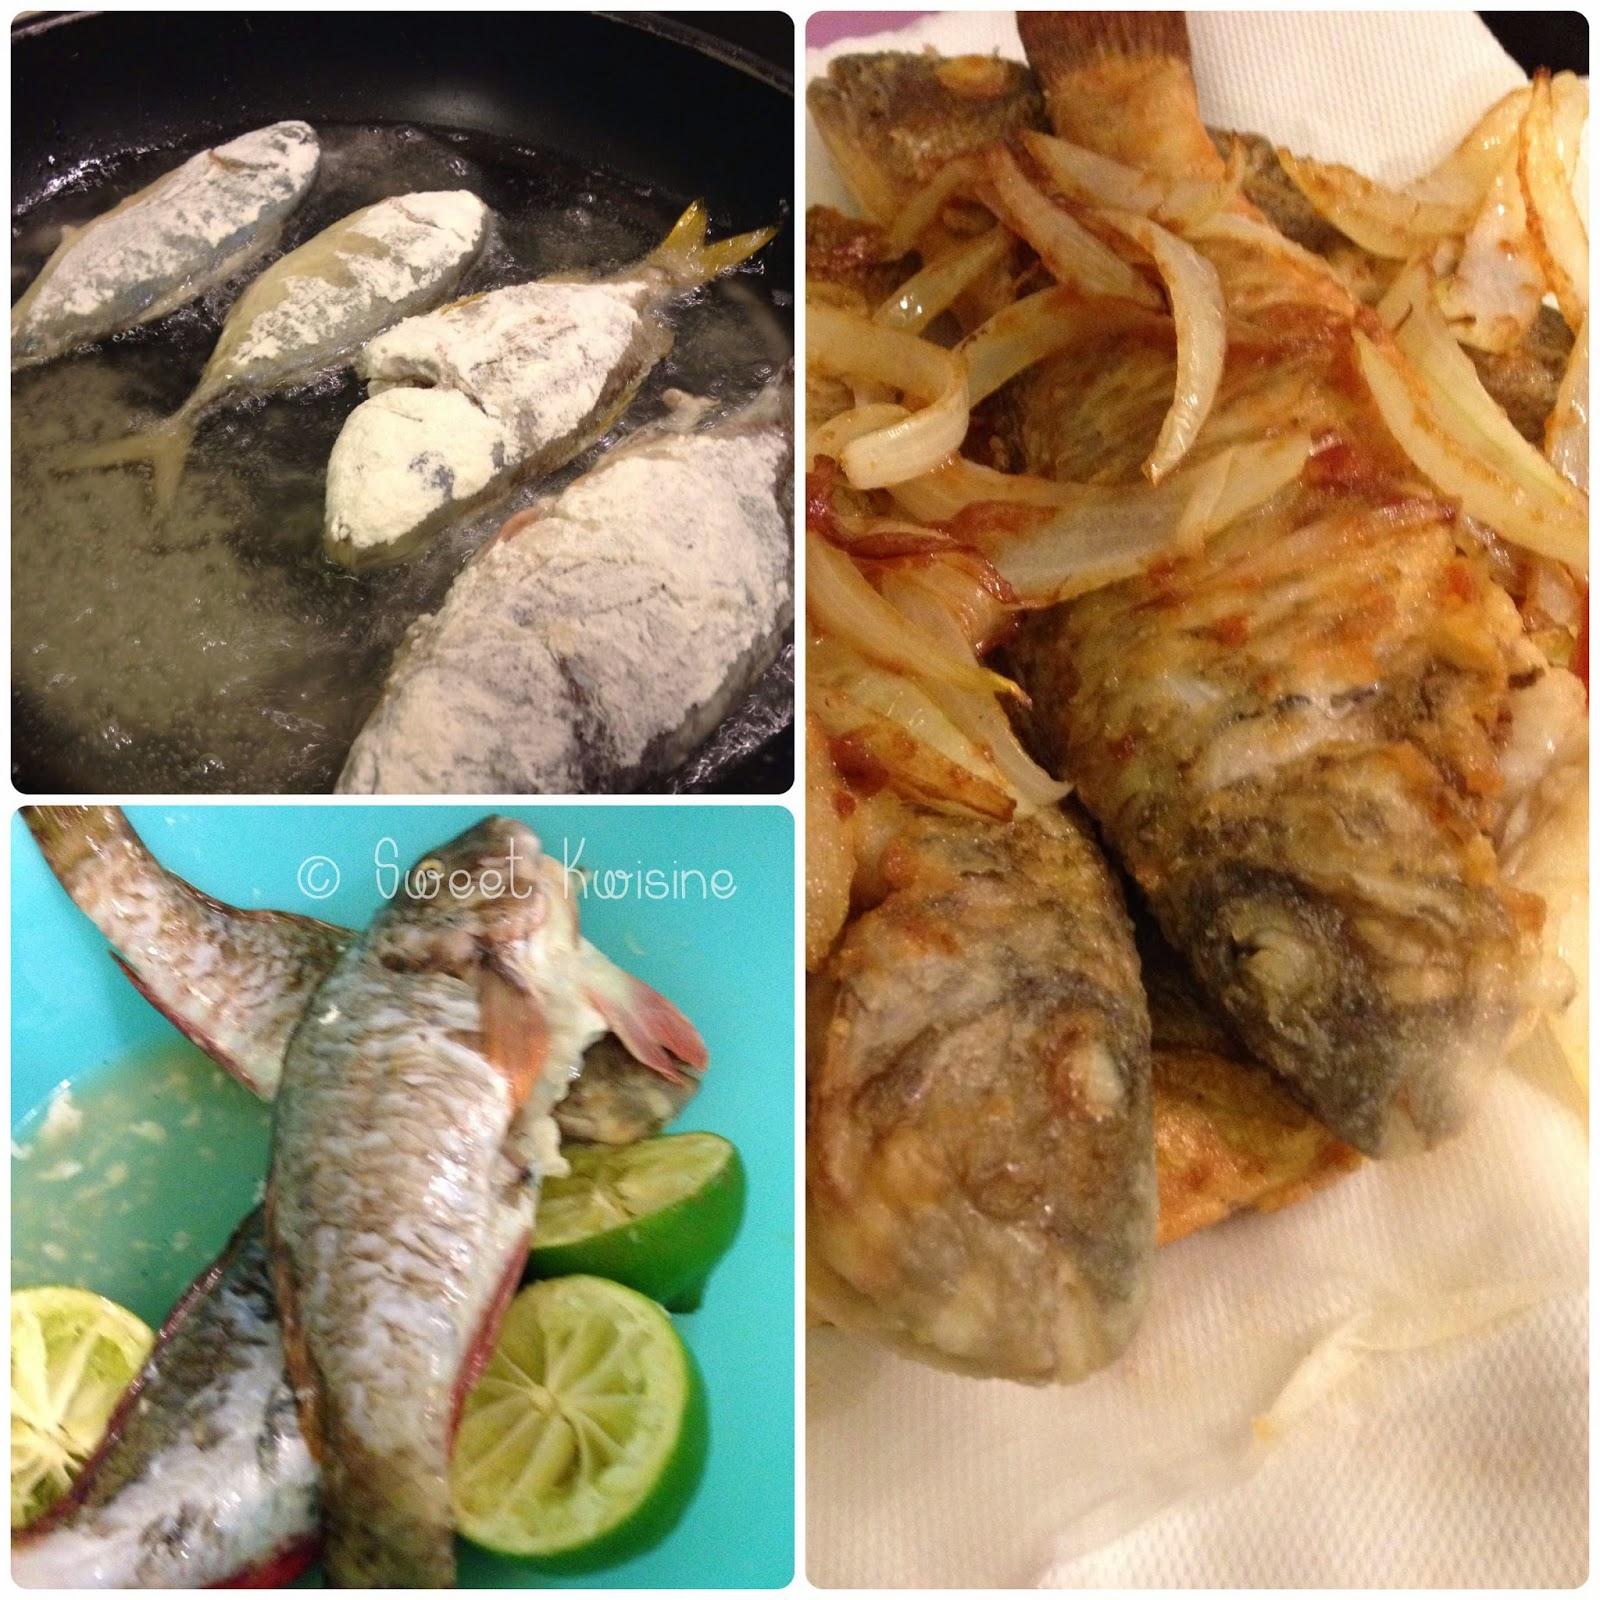 sweet kwisine, poisson, poisson frit, friture, martinique, cuisine antillaise, oignons marinés